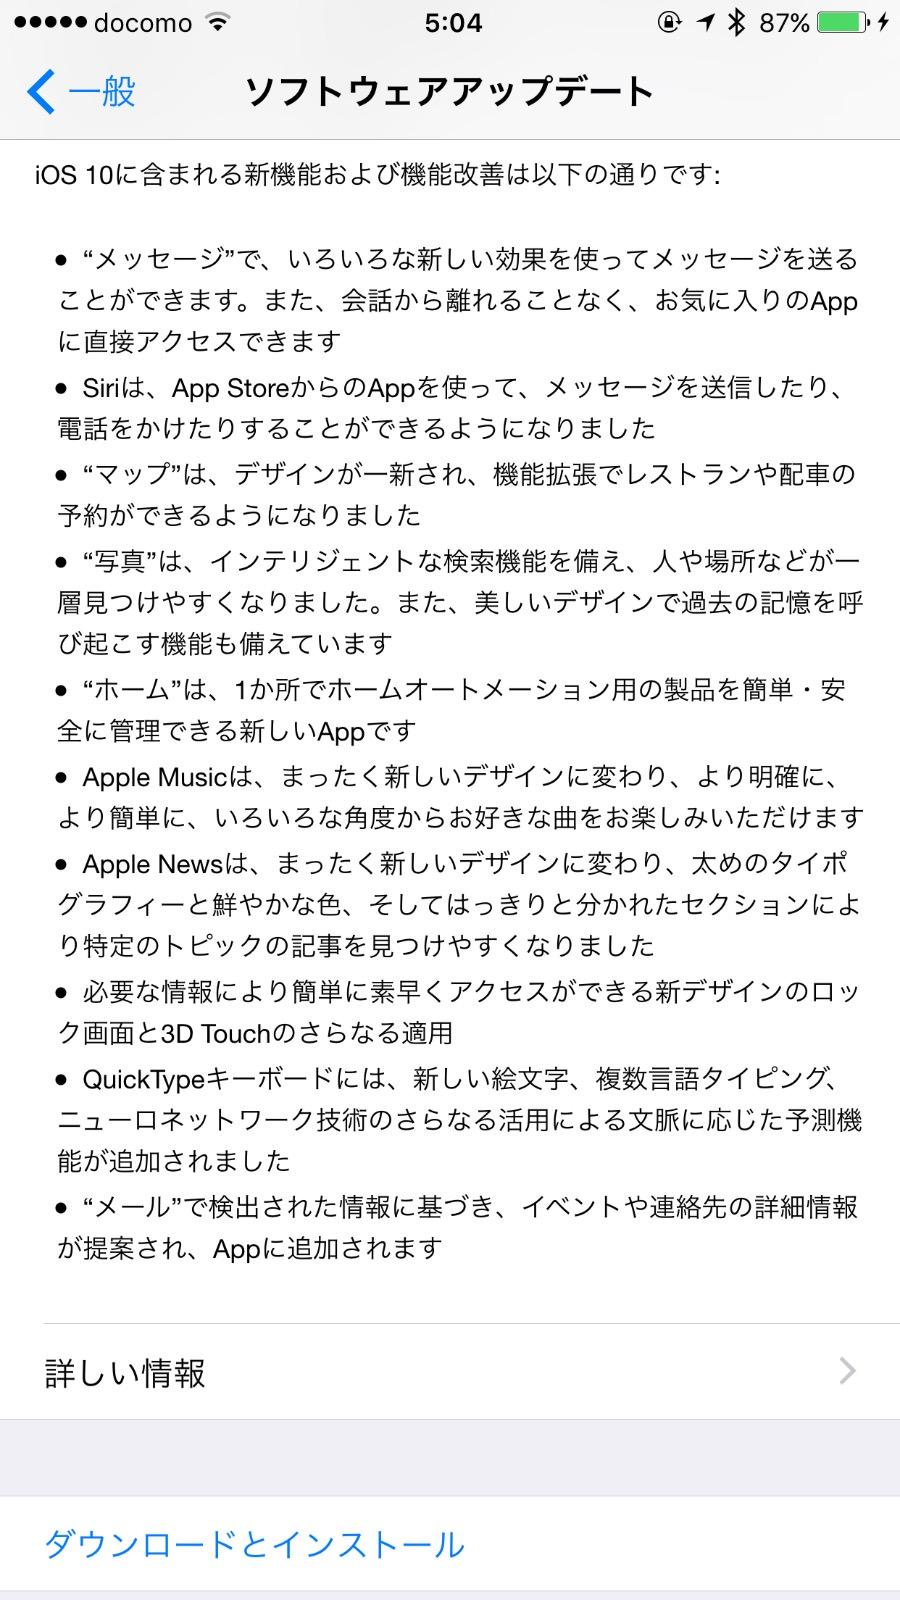 Ios 10 release 8438